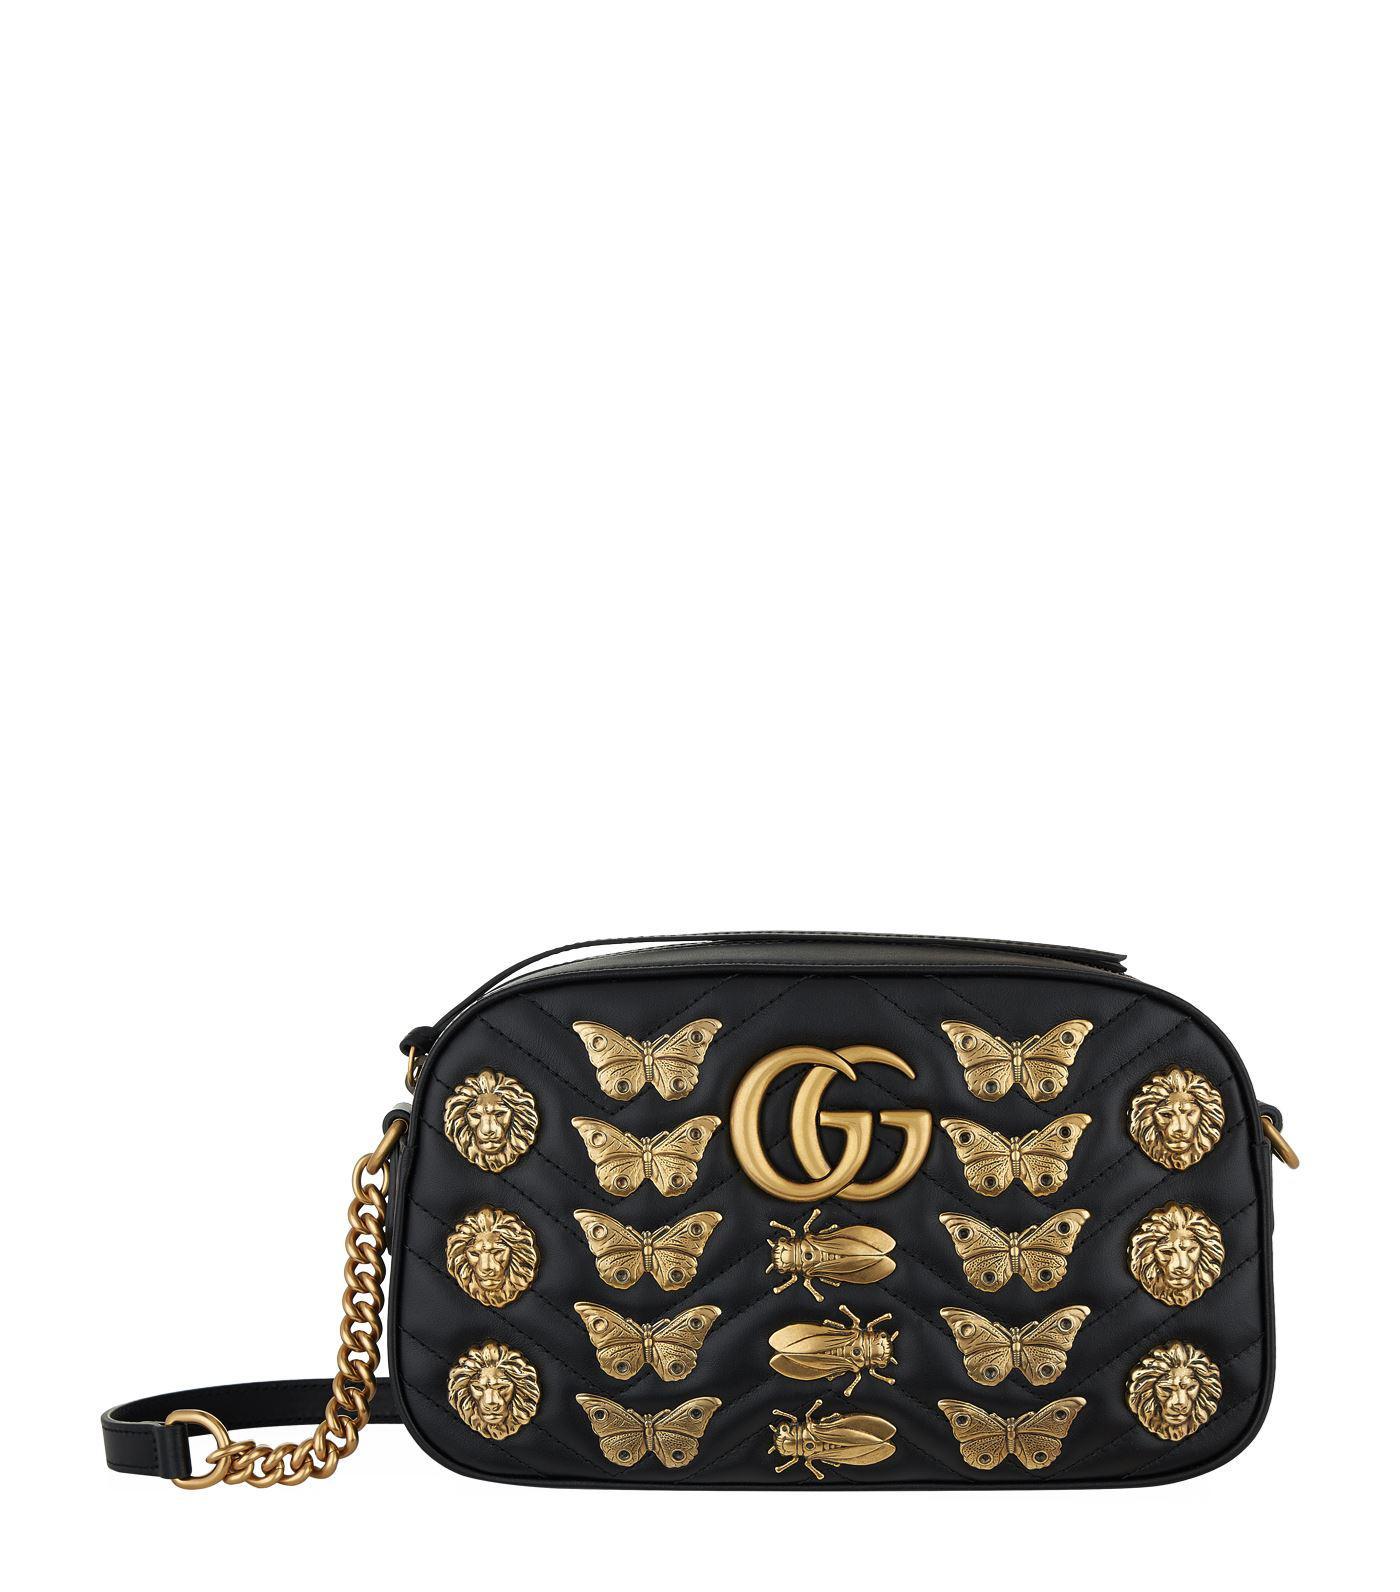 baae4241c37 Lyst - Gucci Marmont Bug Matelass Shoulder Bag in Black